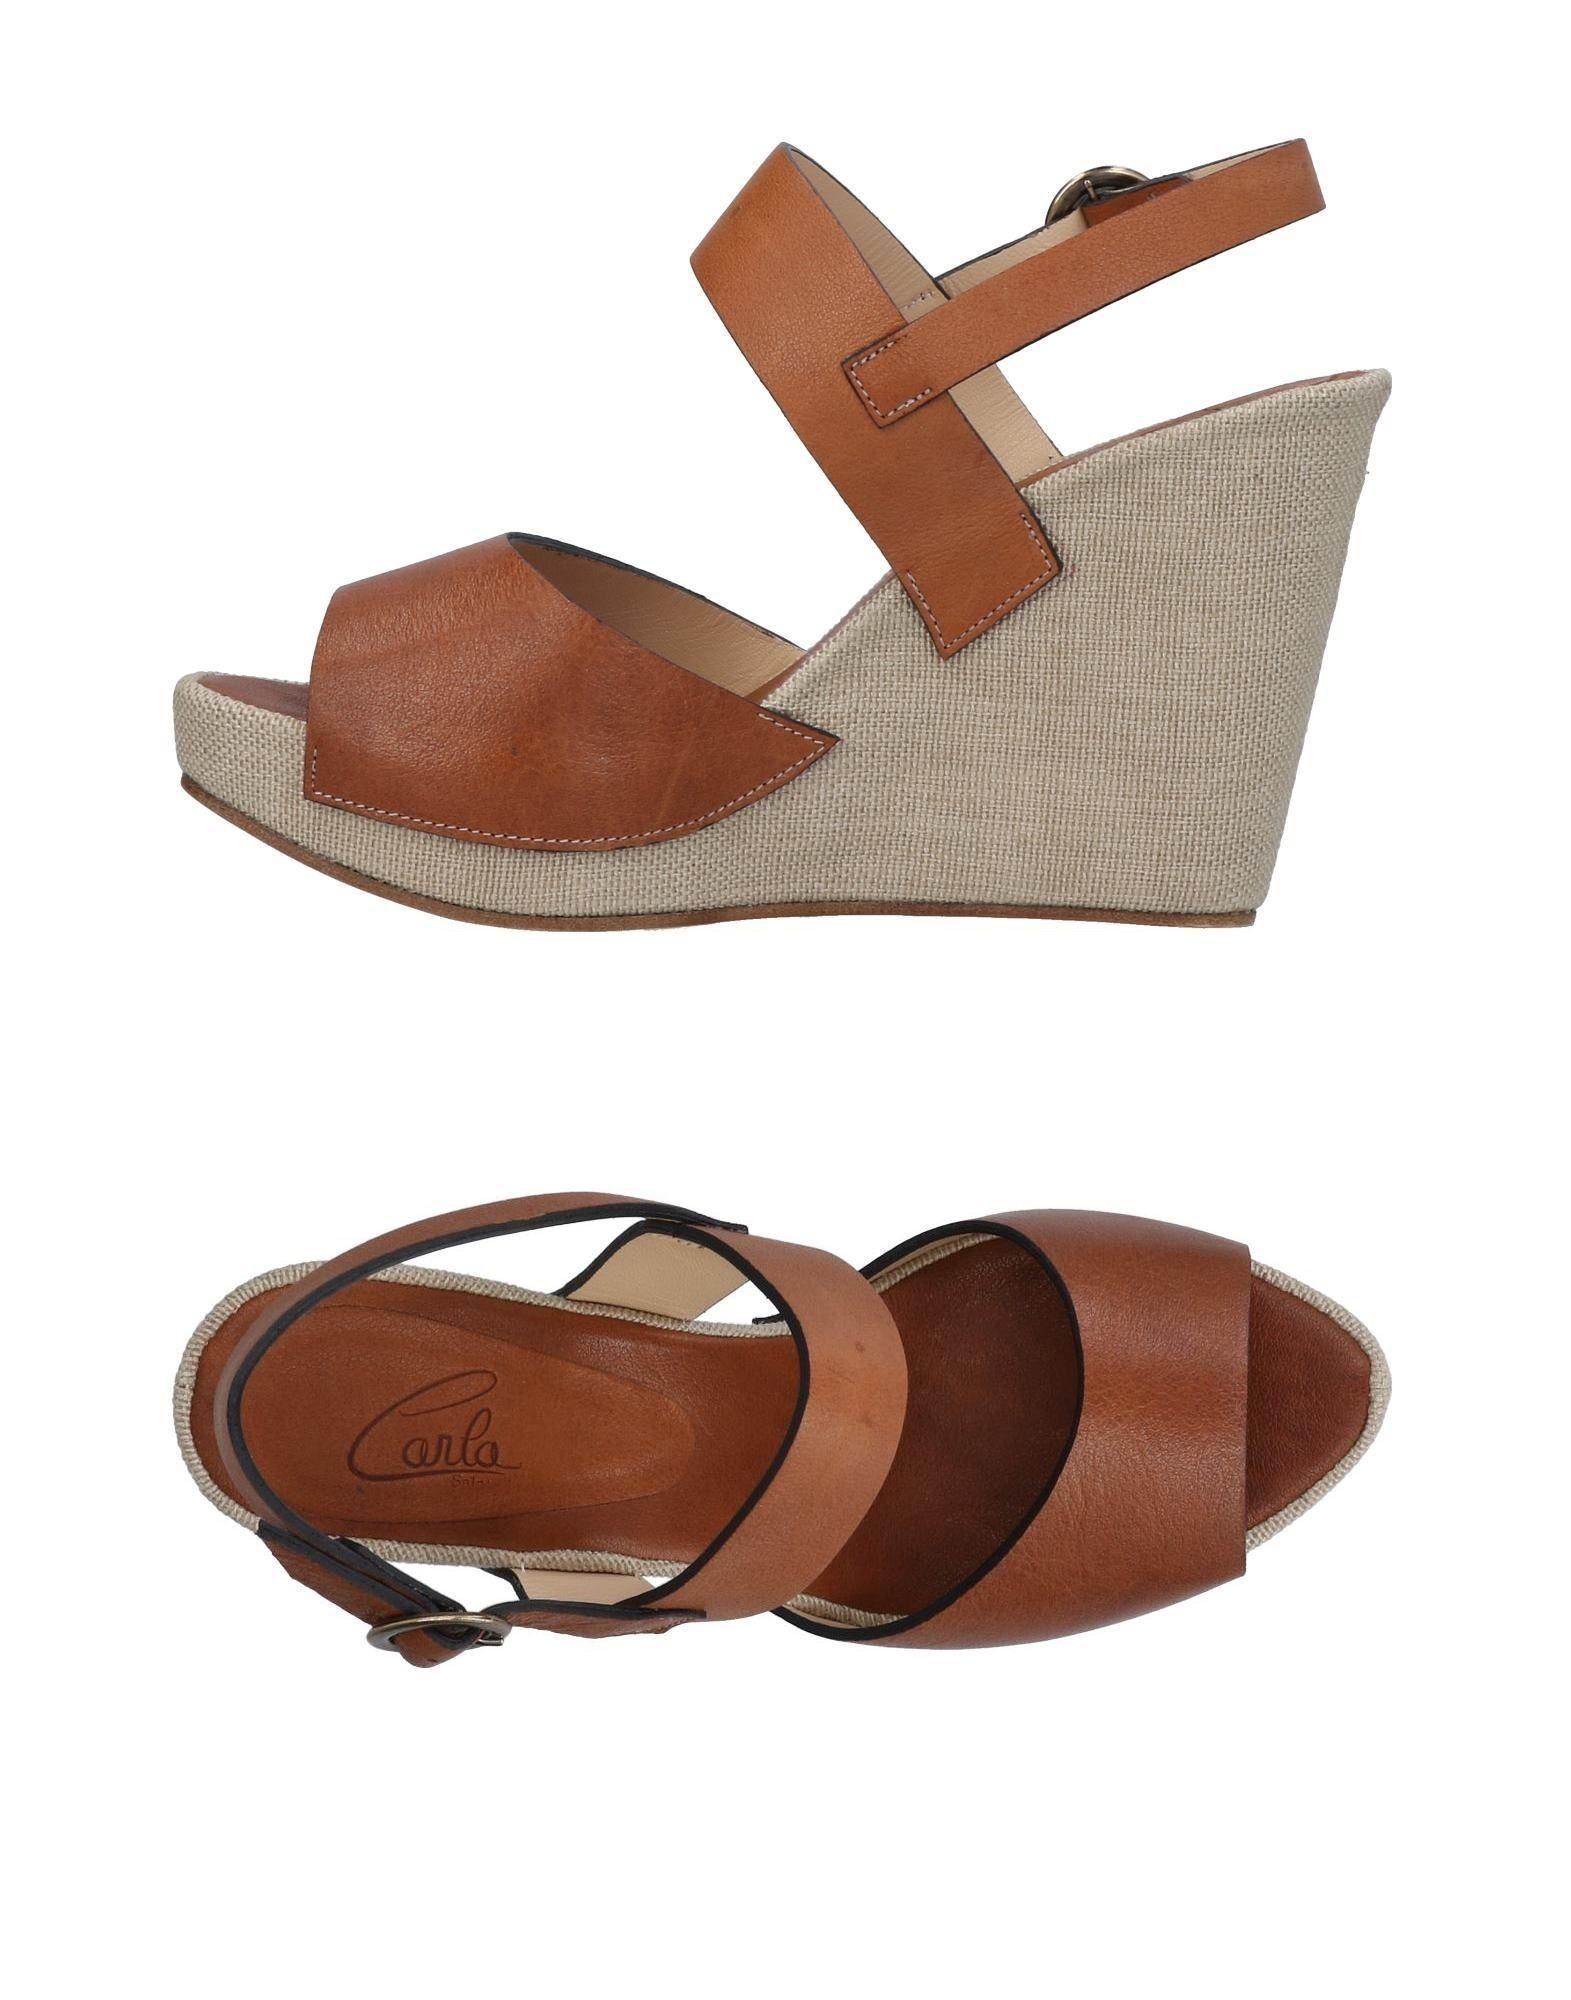 Chaussures - Sandales Carla Saint Barth zeObAirUm